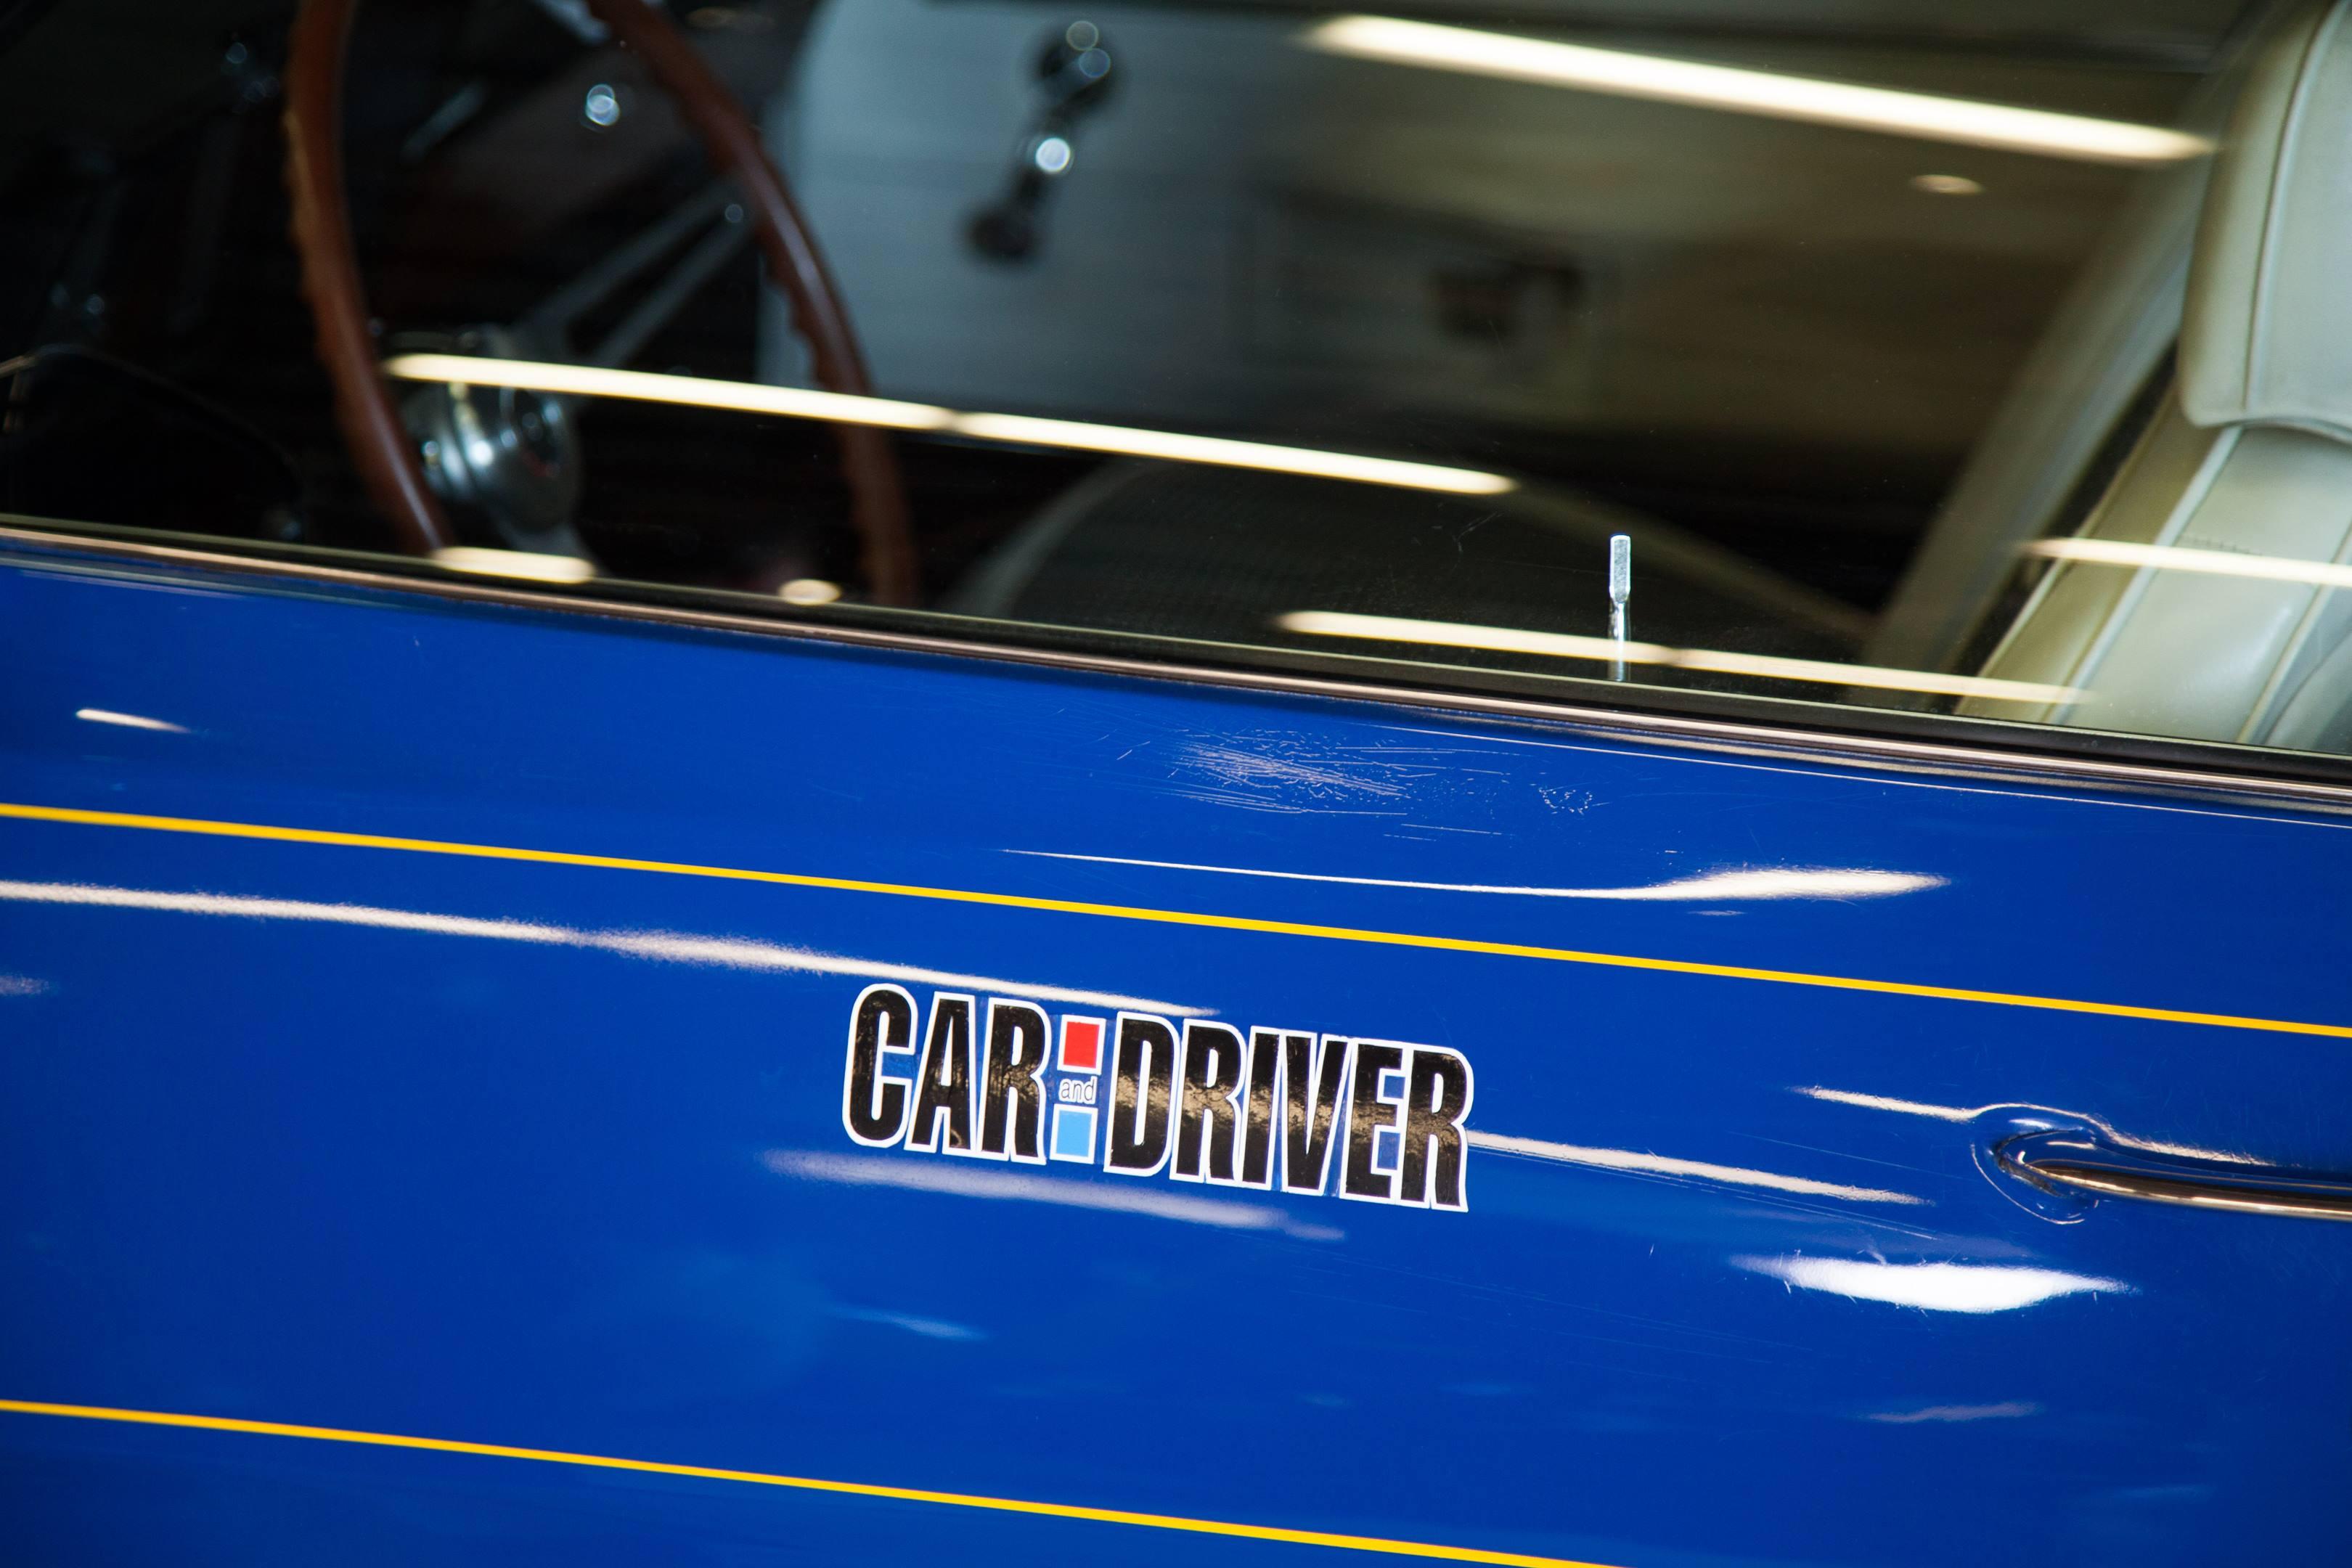 blue maxi 1969 camaro car and driver door label